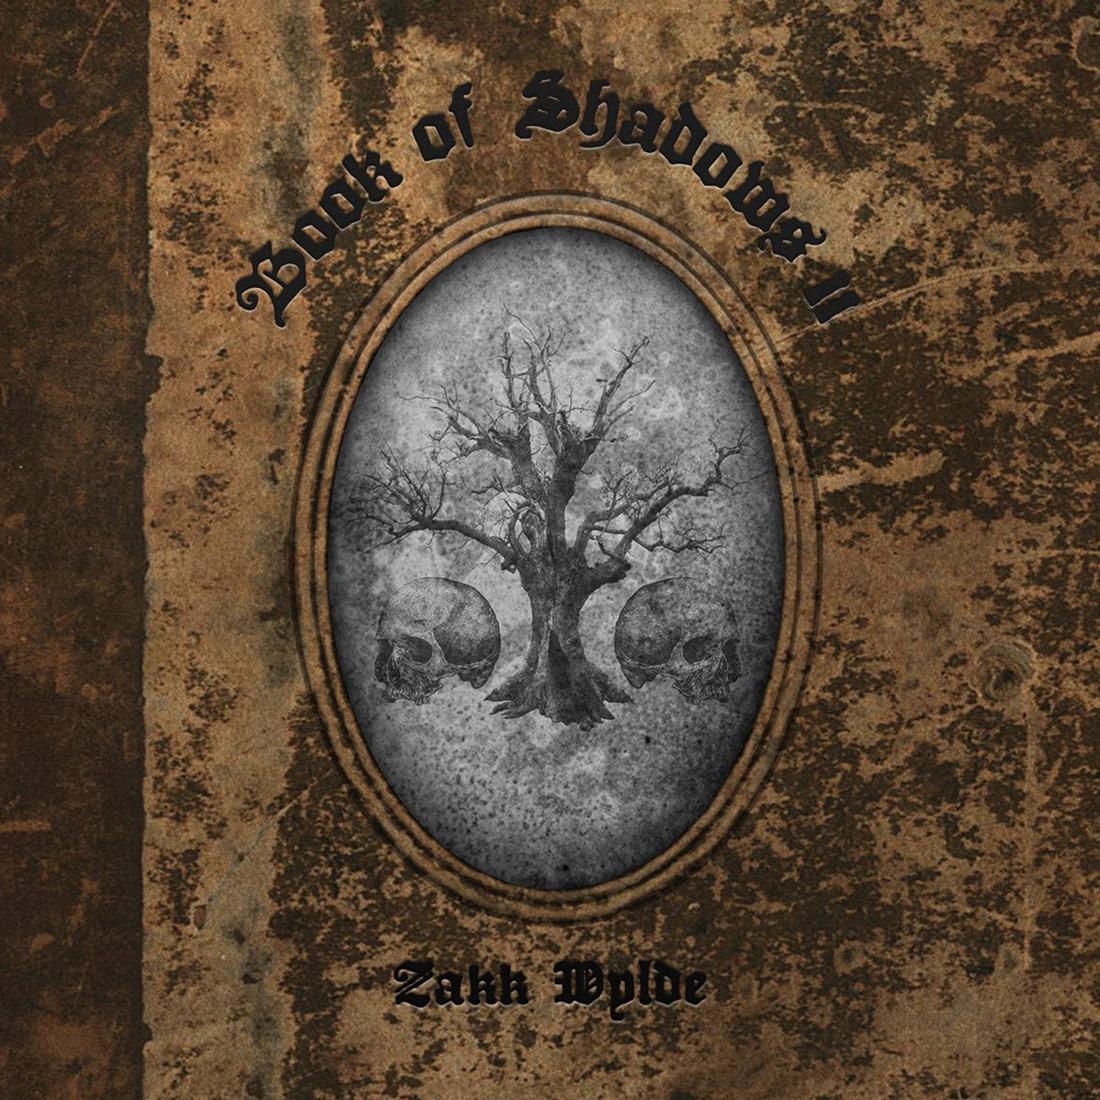 Zakk Wylde: Book Of Shadows II (2016) Book Cover